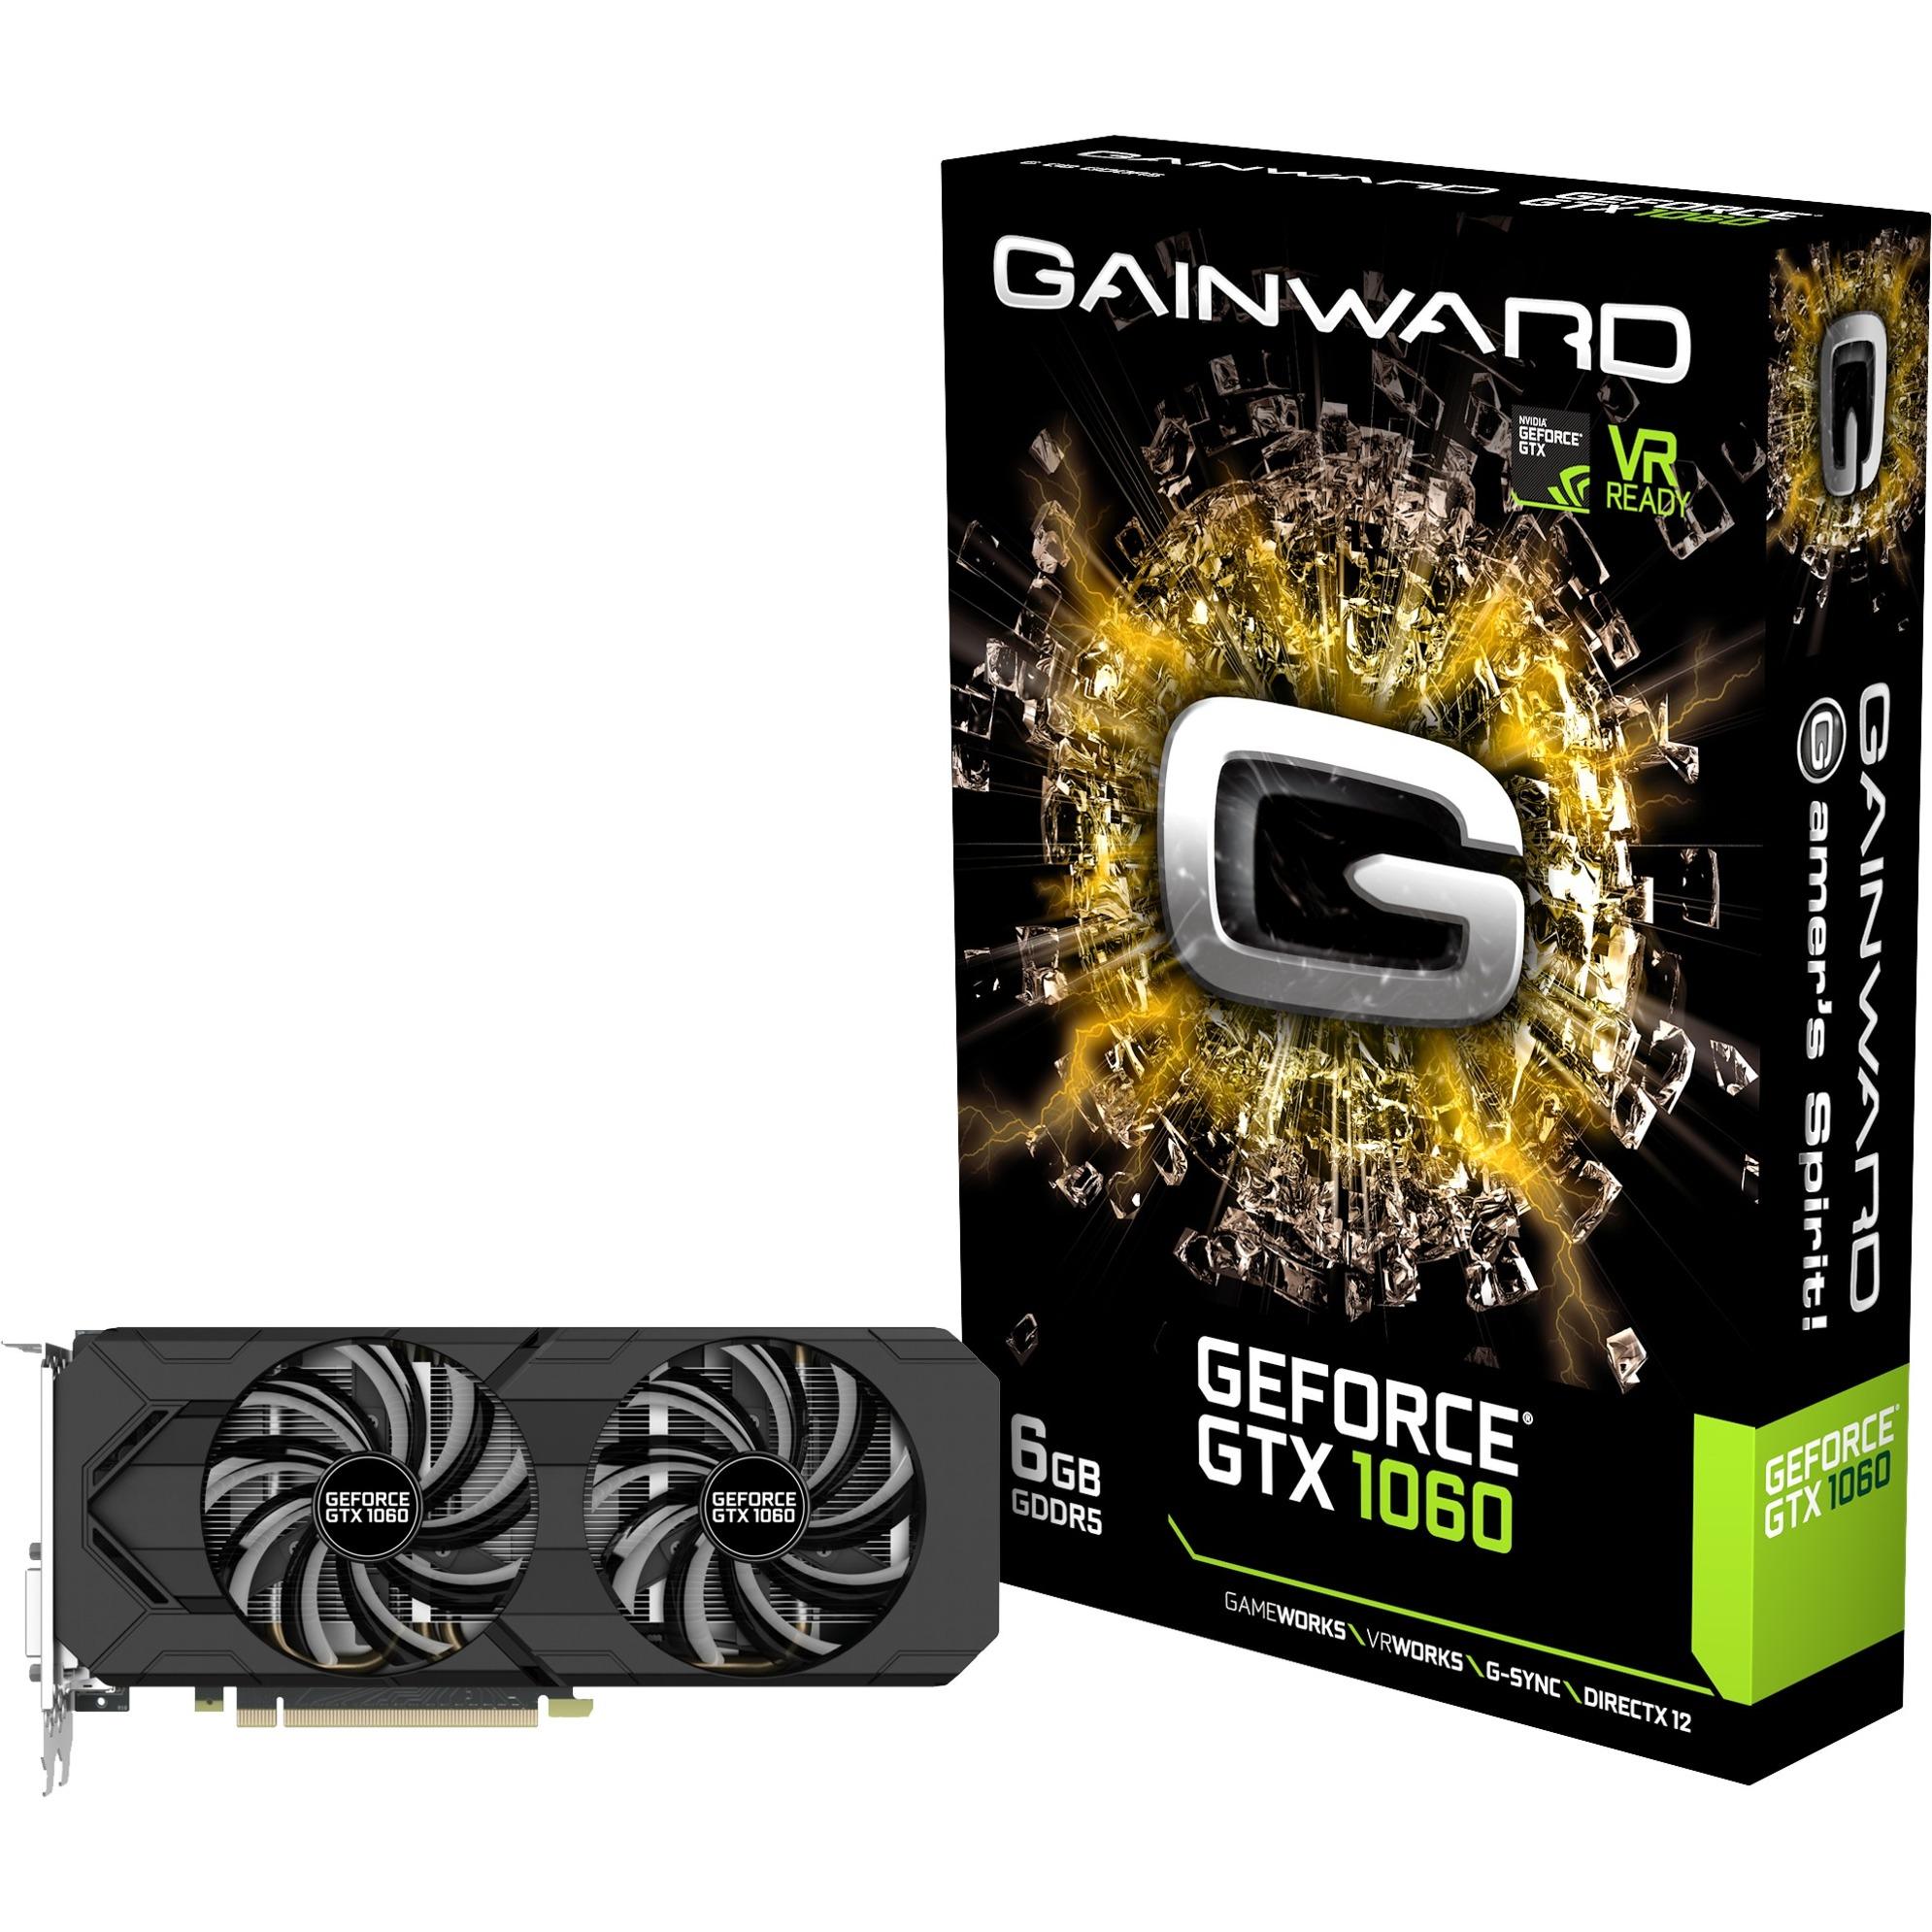 GeForce GTX 1060 6GB, Carte graphique